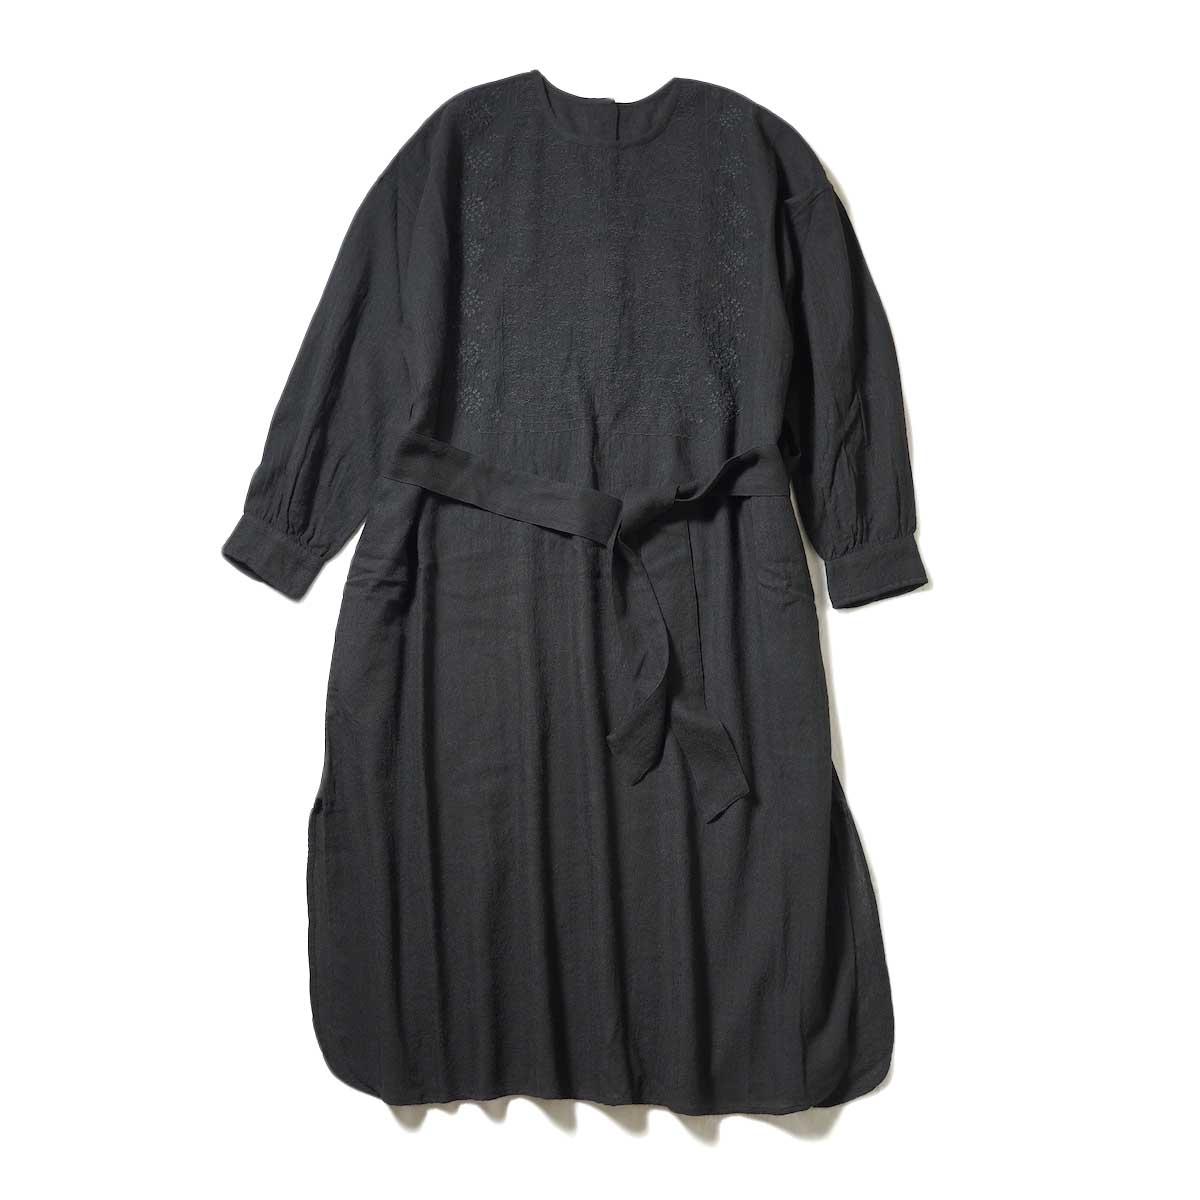 maison de soil / BACK OPENING CREN-NECK EMS SHIRT DRESS (Black)